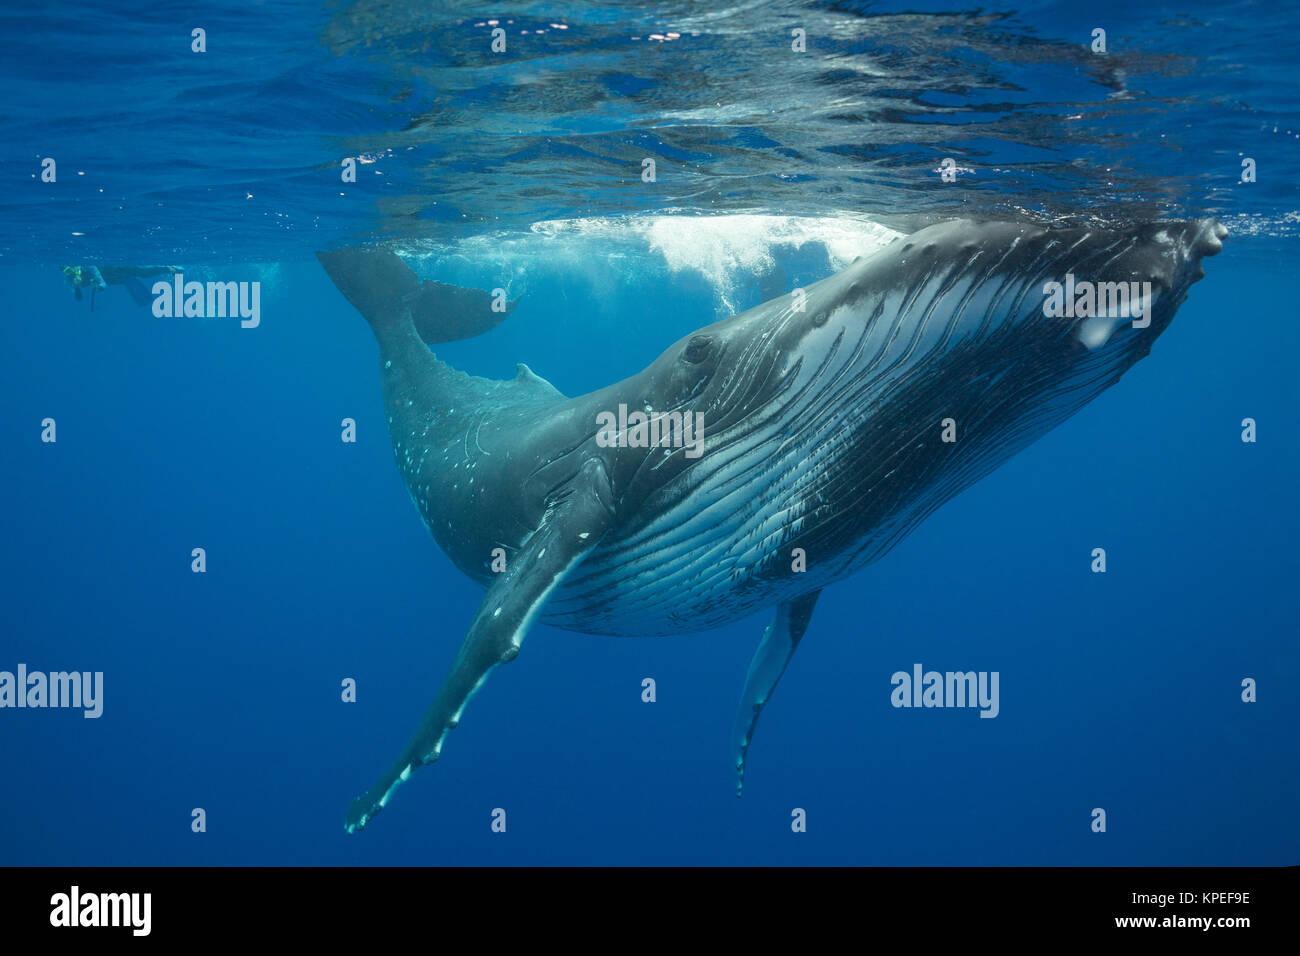 Humpback Whale, Megaptera novaeangliae, e snorkeling, Vava'u, Regno di Tonga, South Pacific MR 497 Immagini Stock